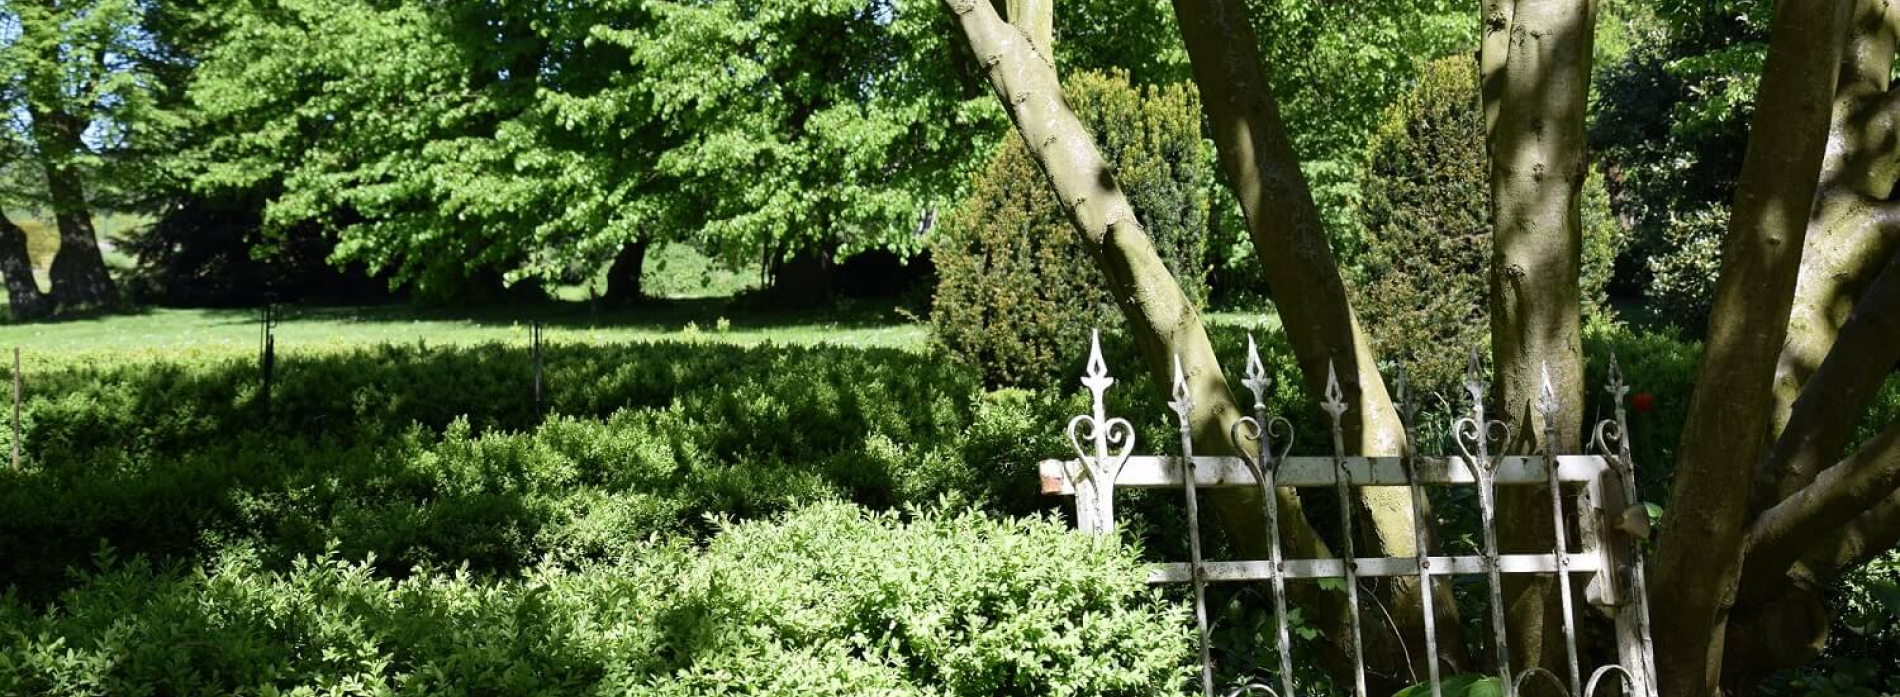 Gutshaus Volzrade Gartentor Garten